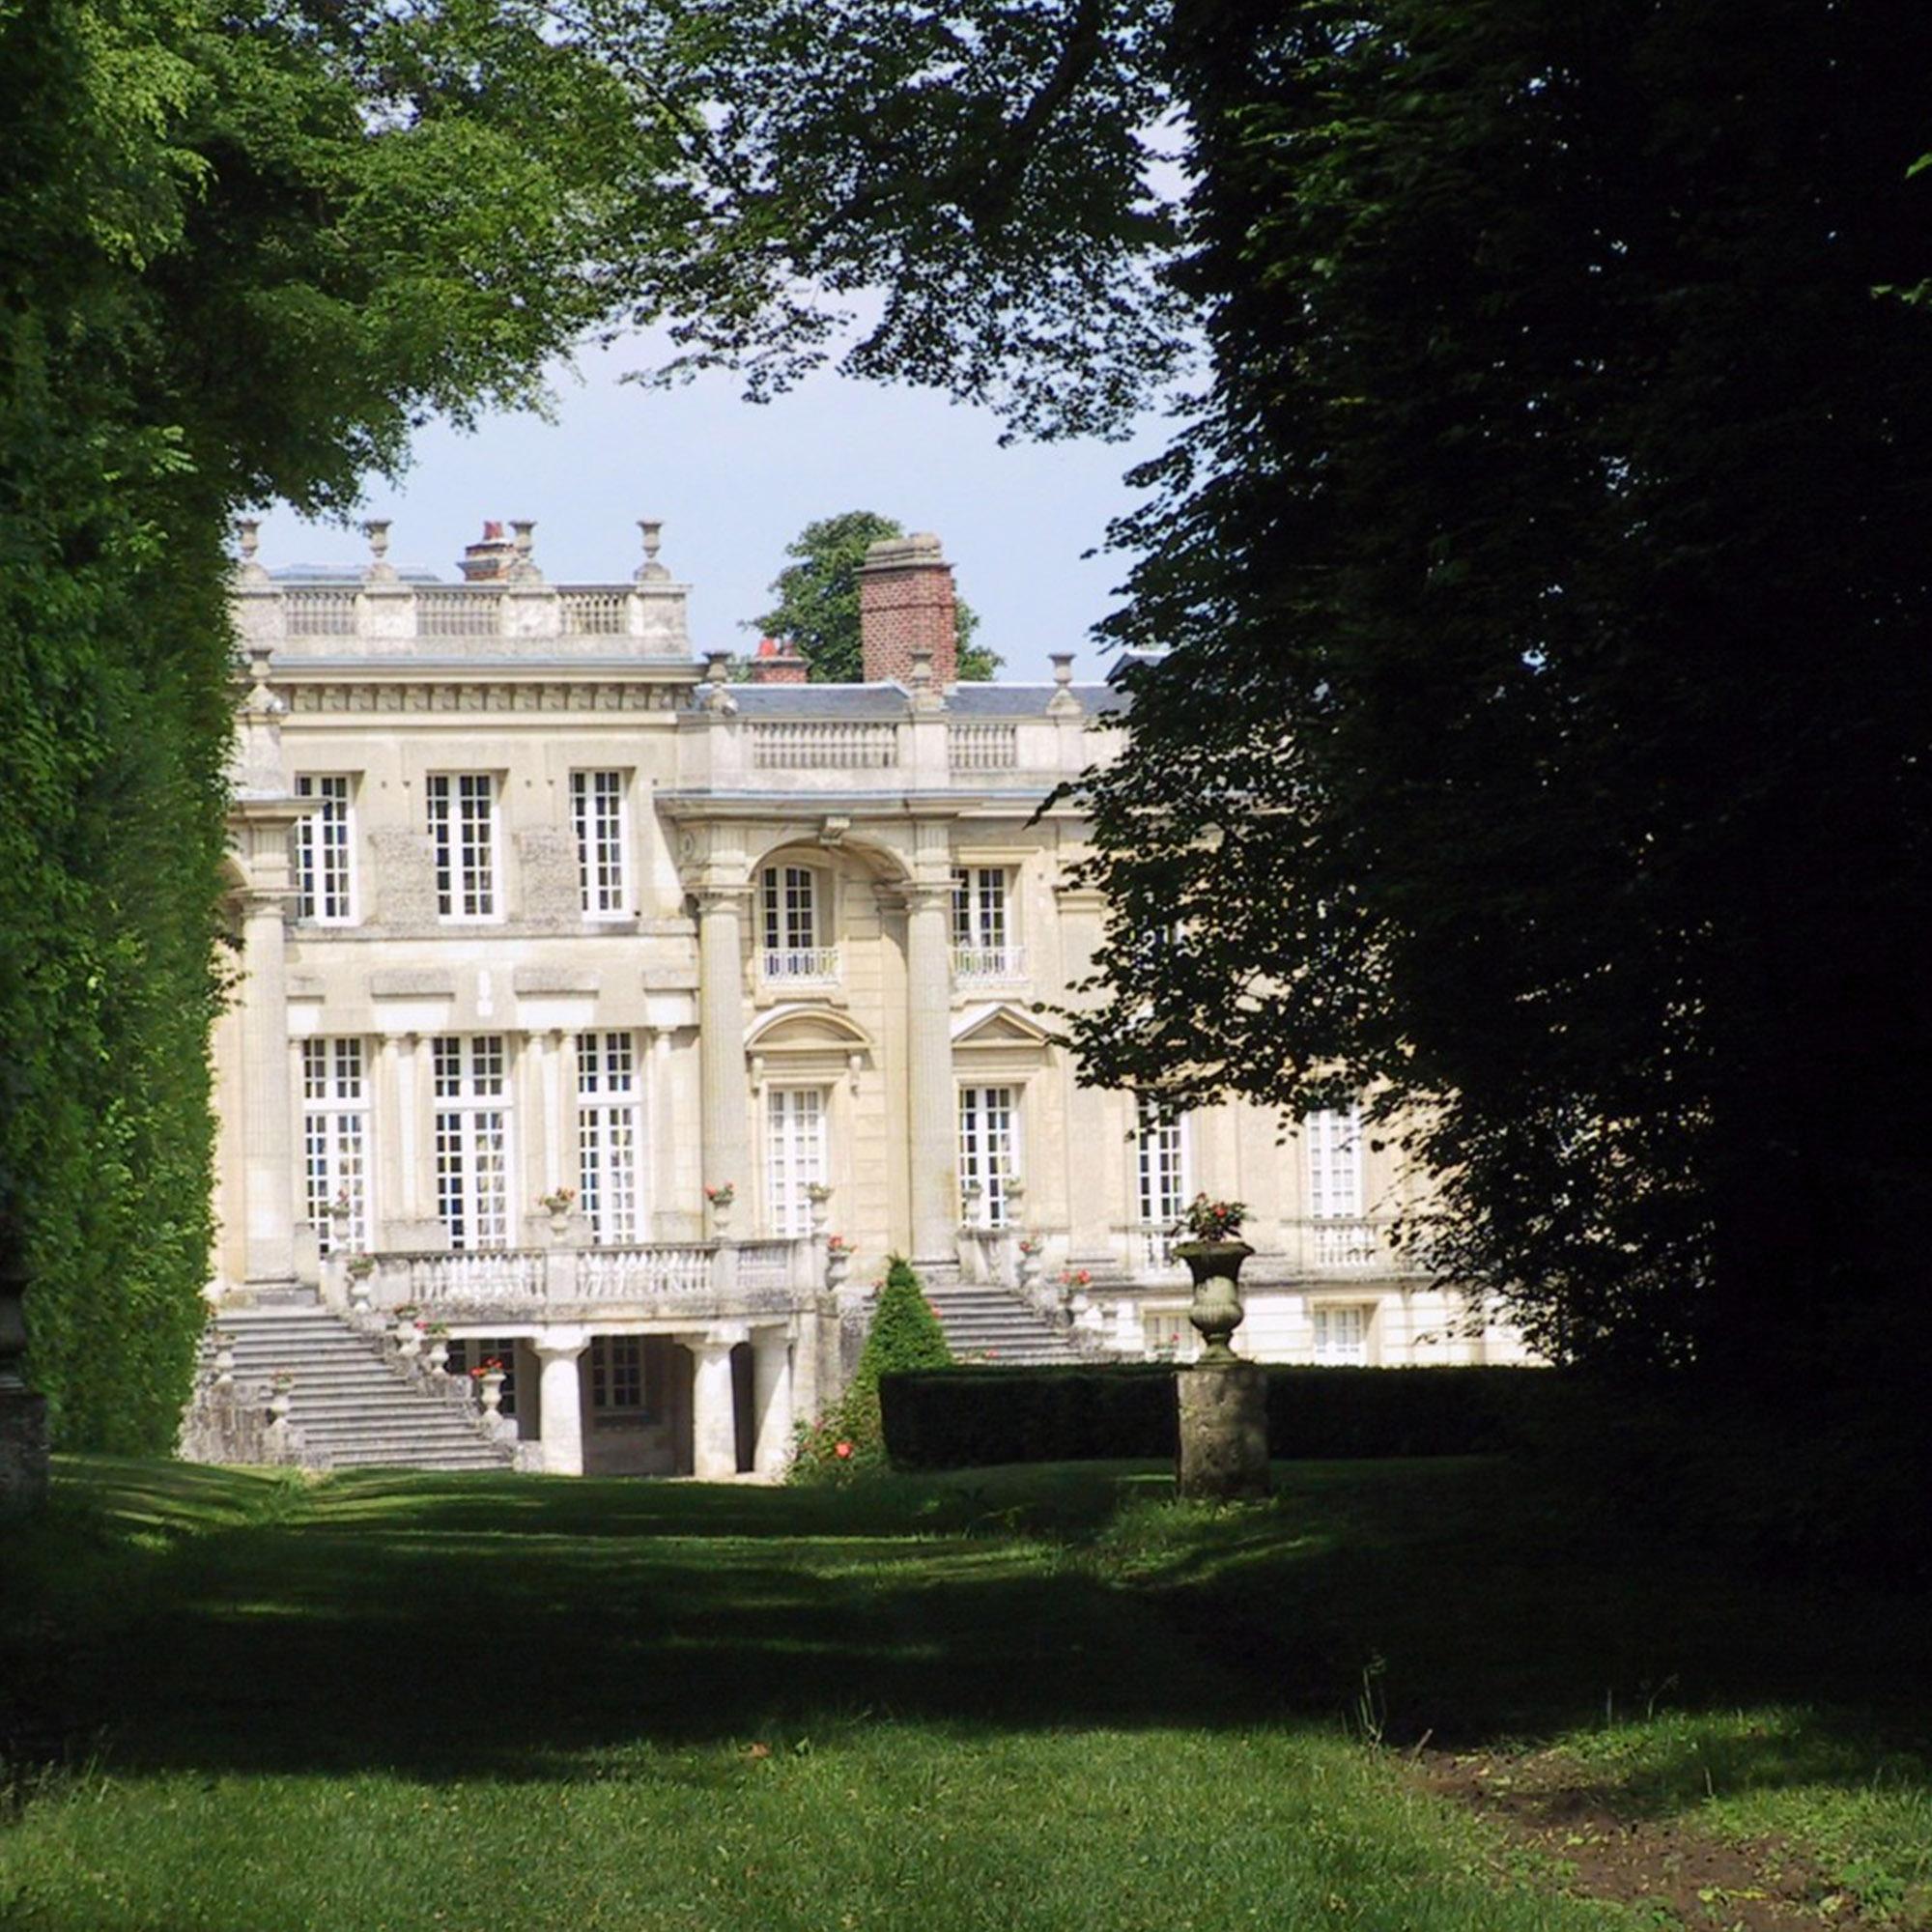 chateau_de_Versigny_gîte_saint_germain_oise_versigny_4